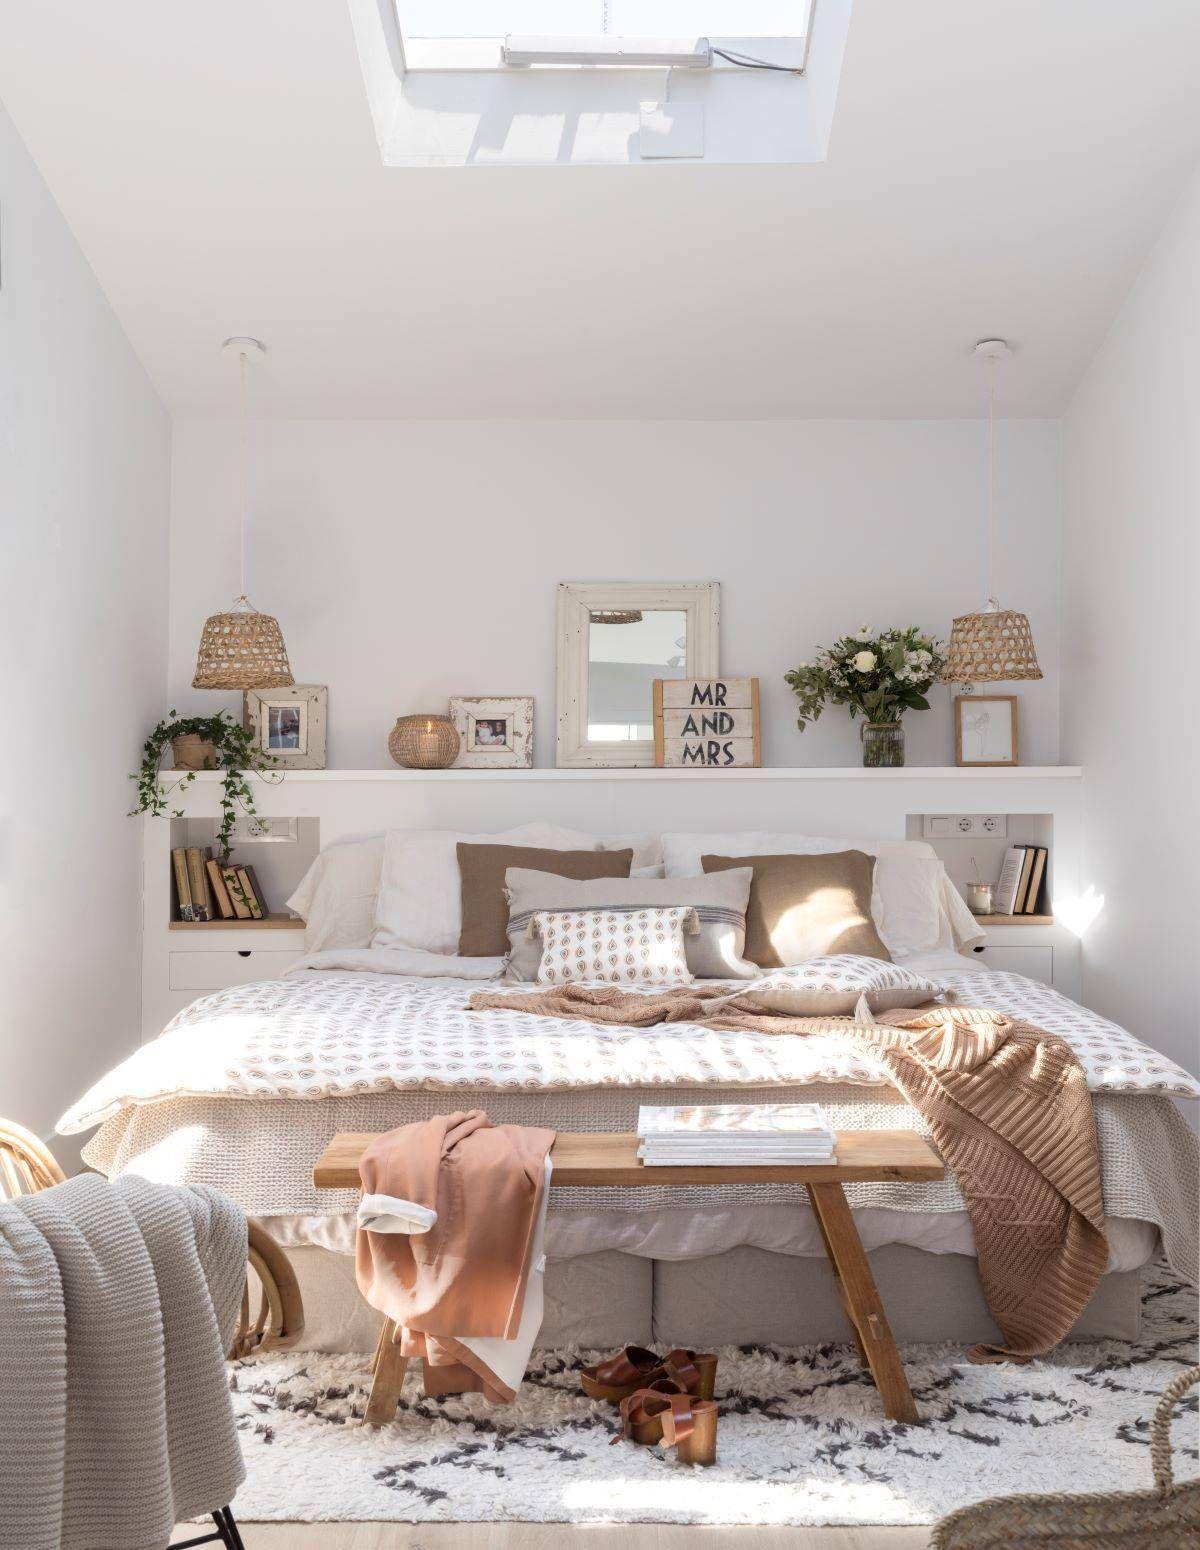 Dormitorios: Muebles e ideas para decorar tu dormitorio – ElMueble